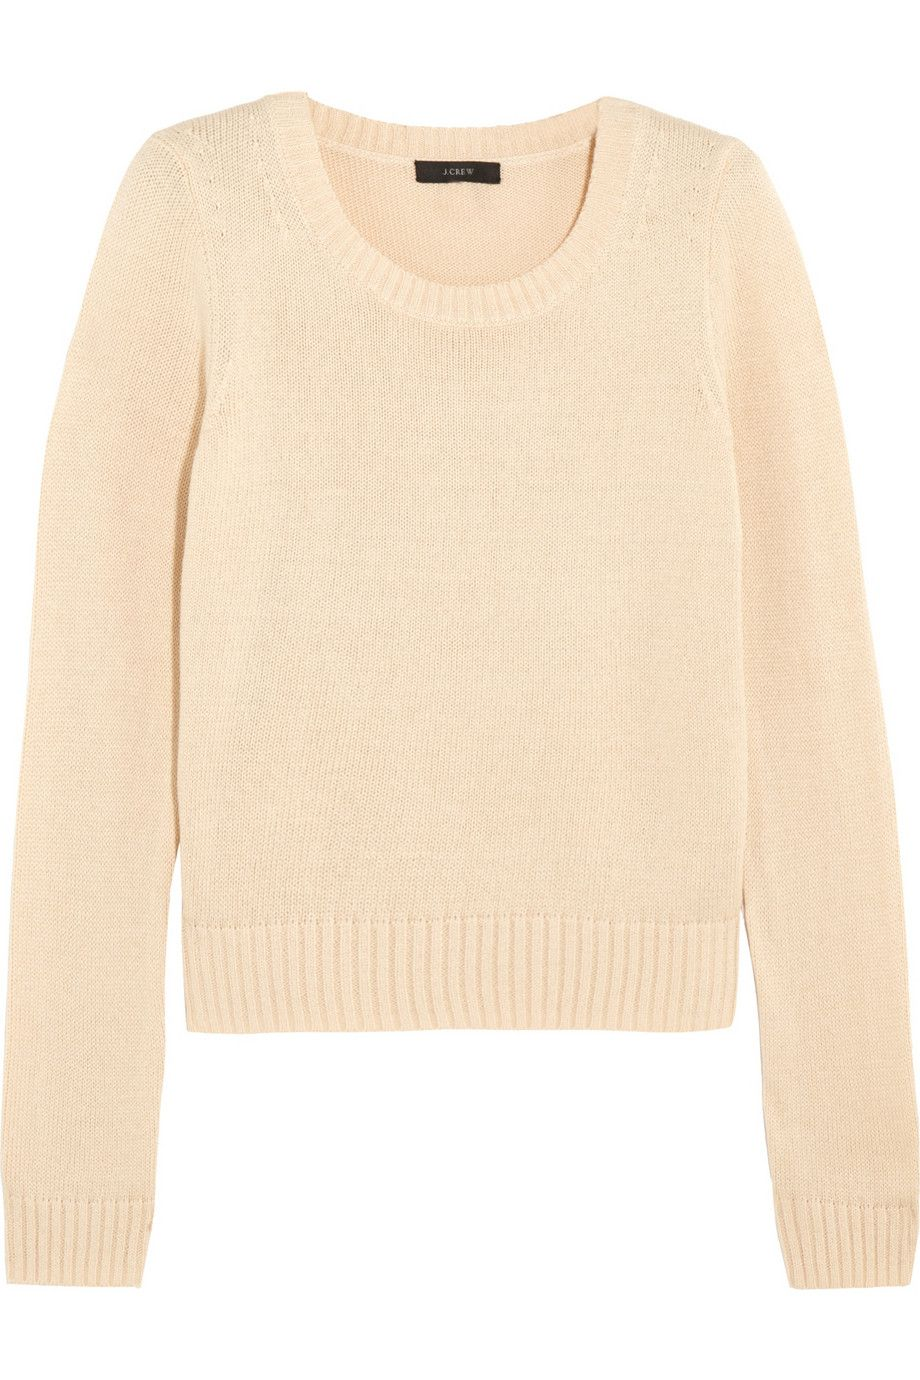 J.Crew | Cropped cotton sweater | NET-A-PORTER.COM | Stuff I ...